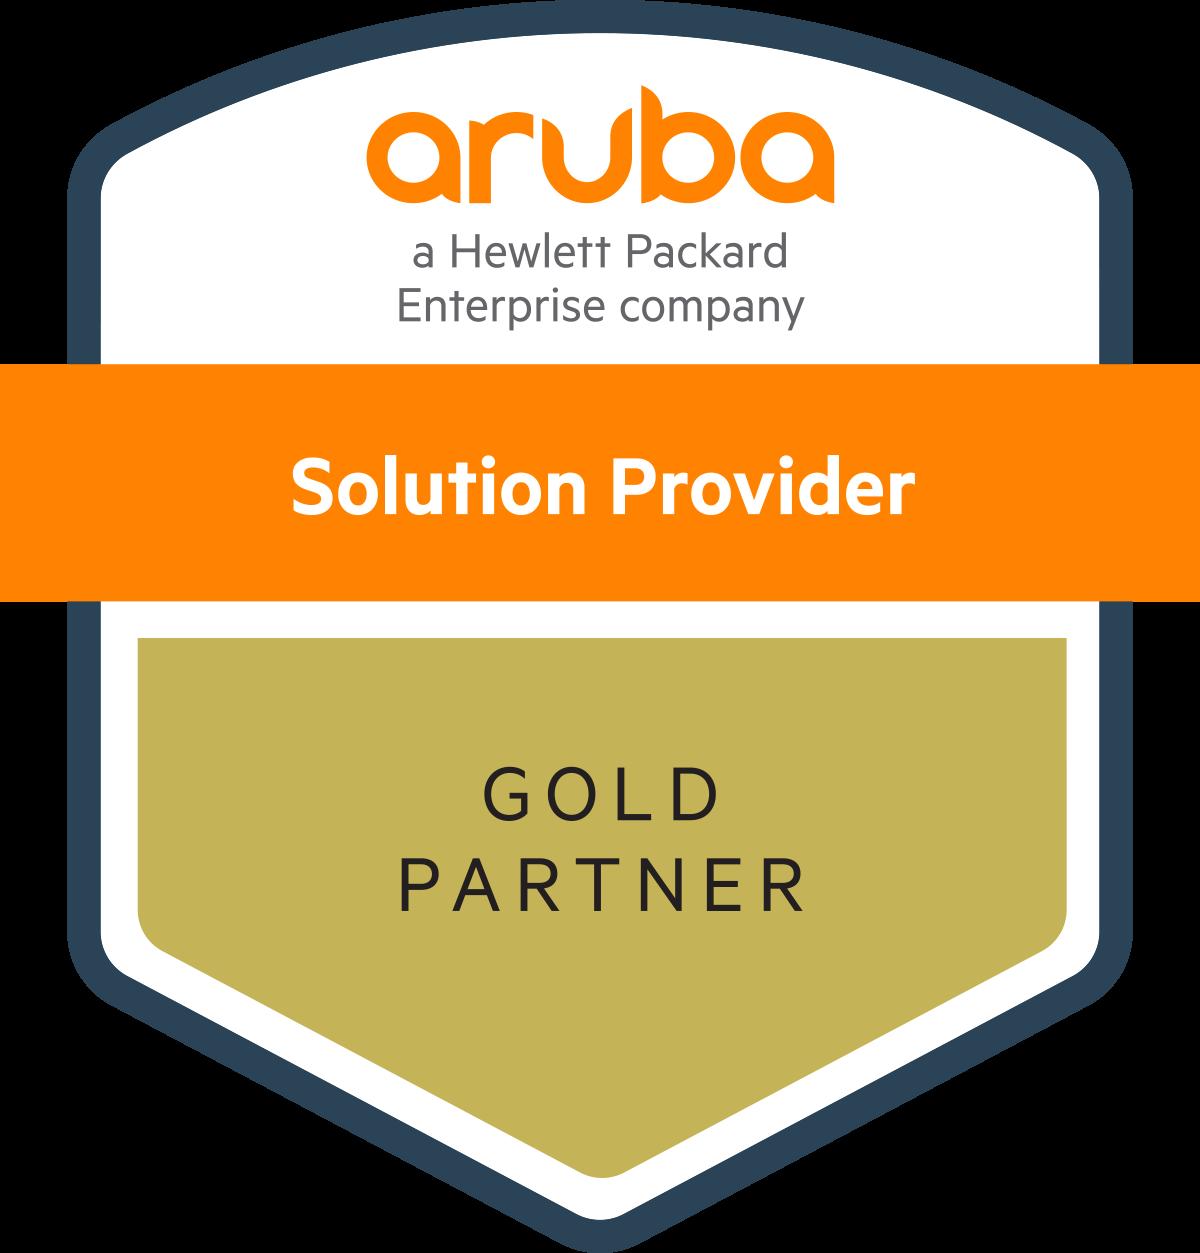 aruba solution provider gold partner graphic